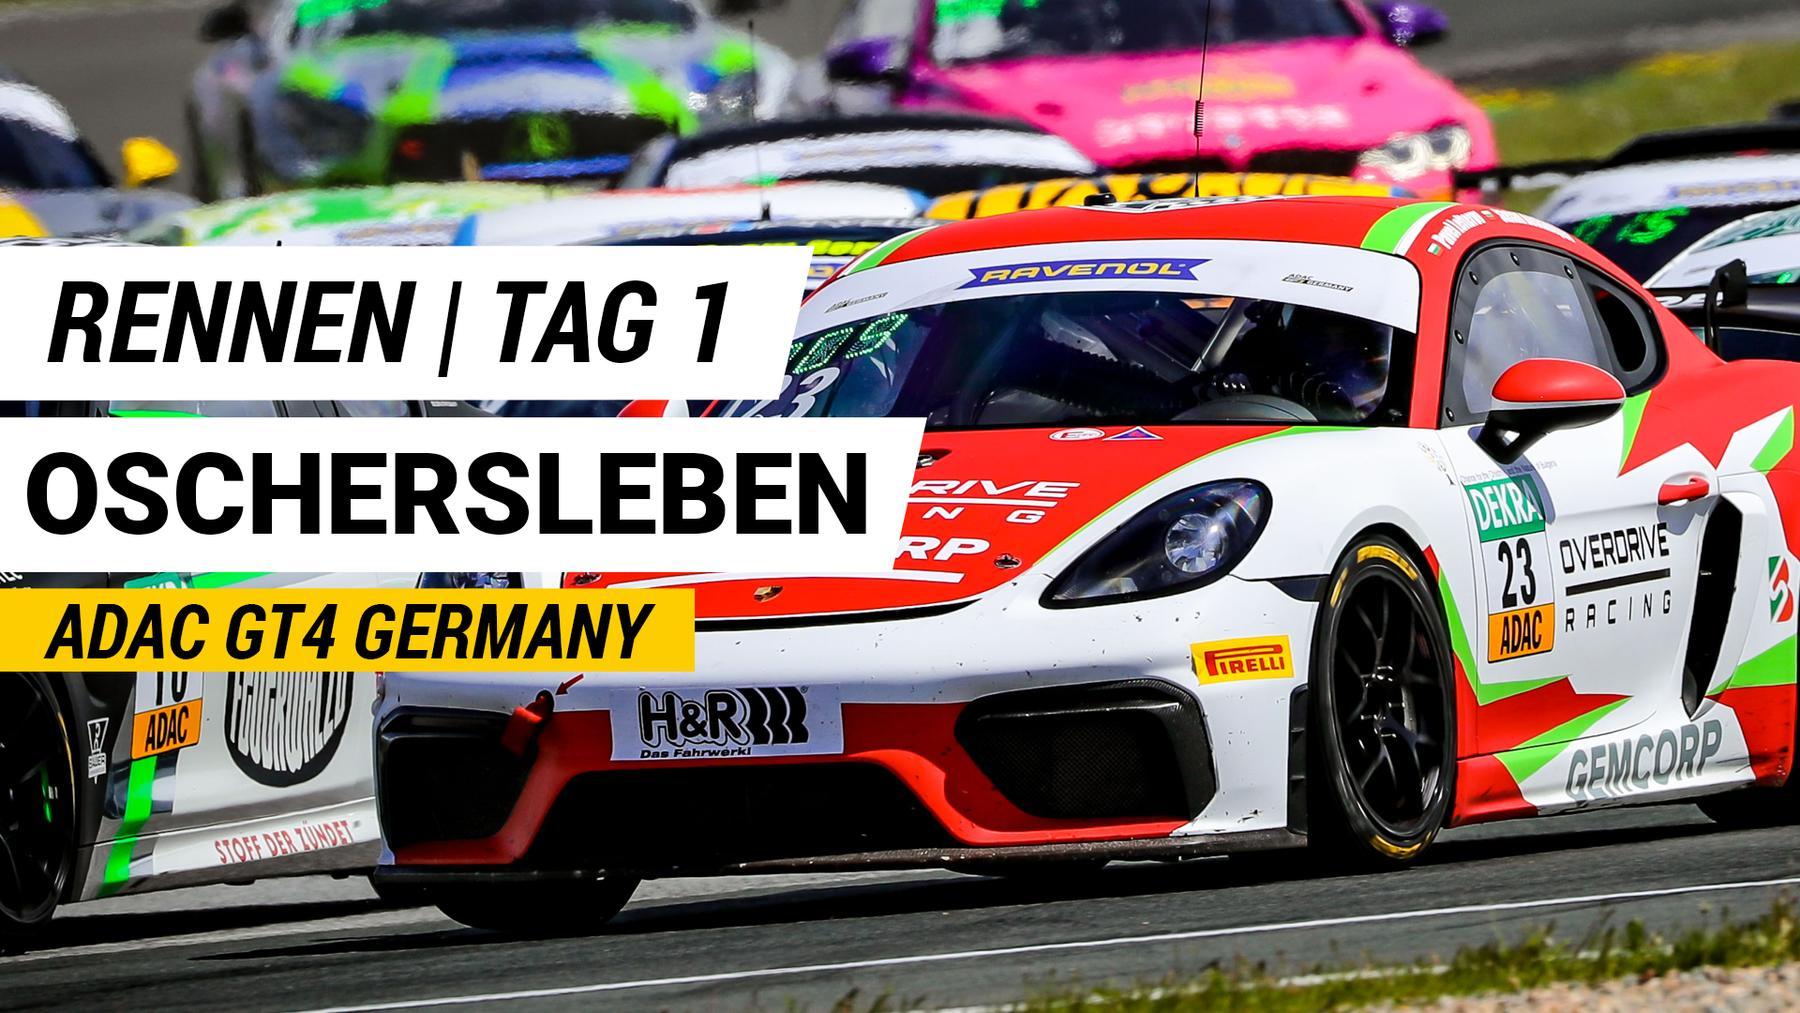 Oschersleben - Rennen 1